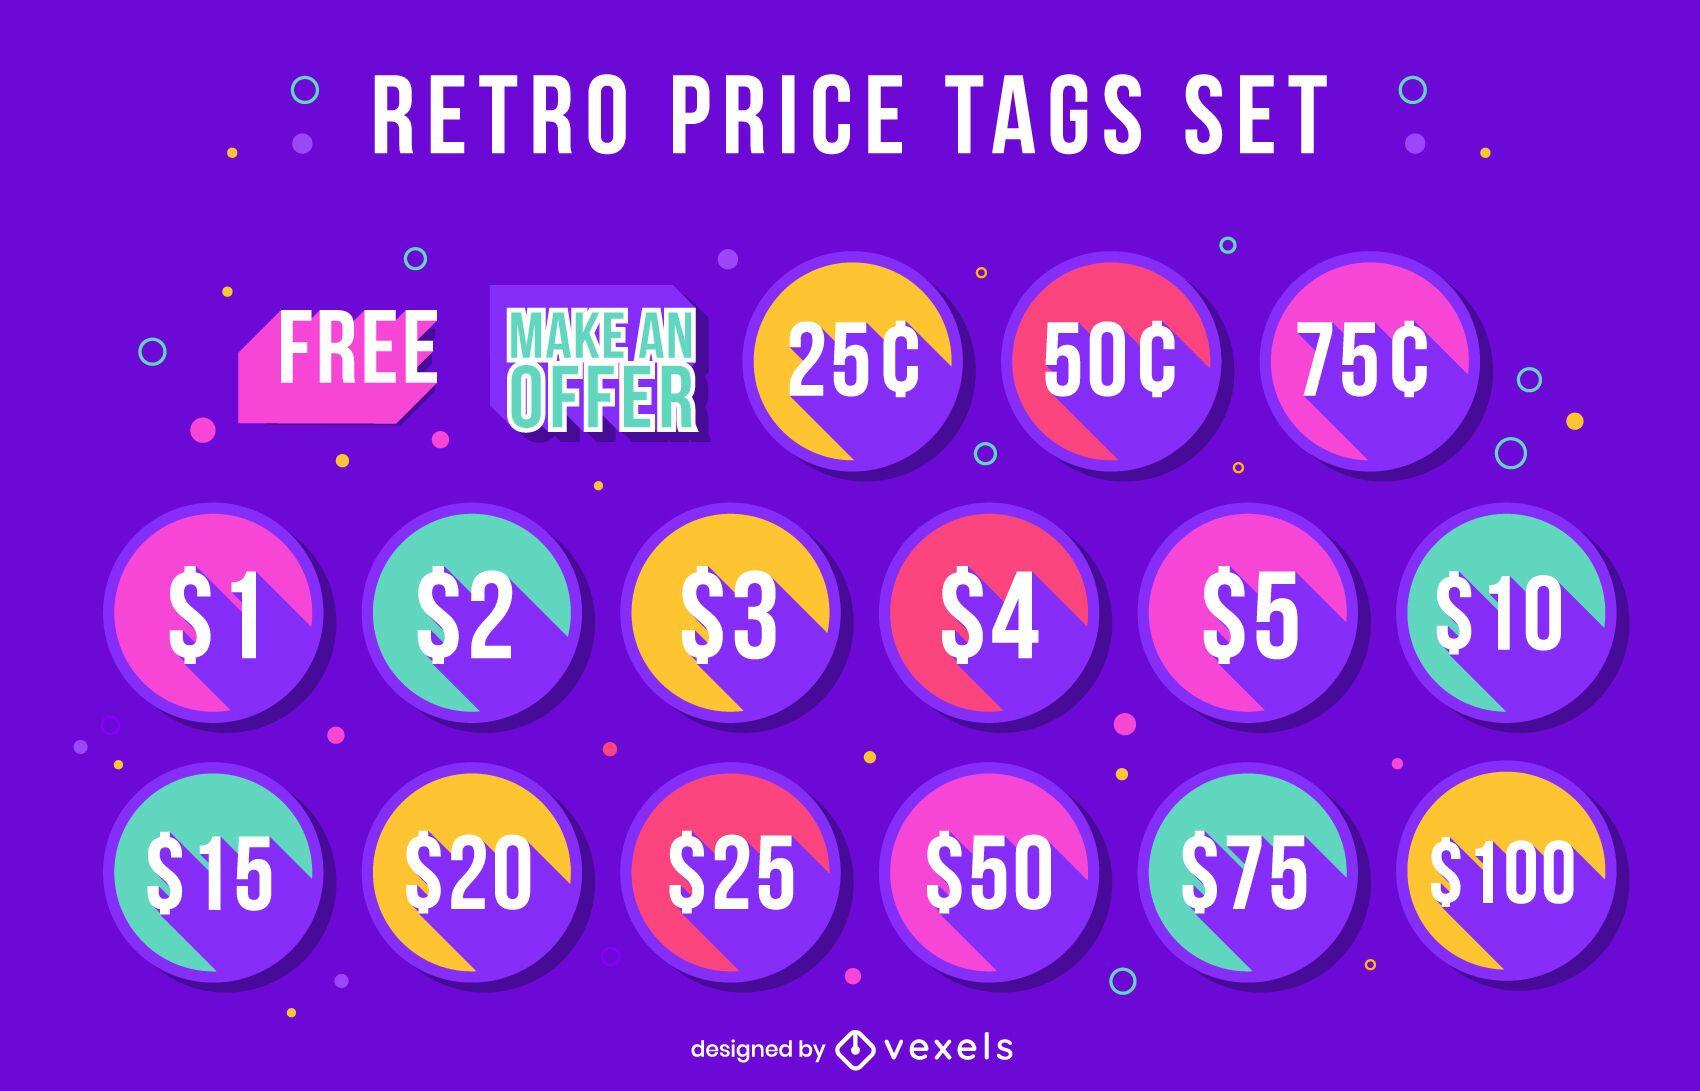 Price tags discount retro style set